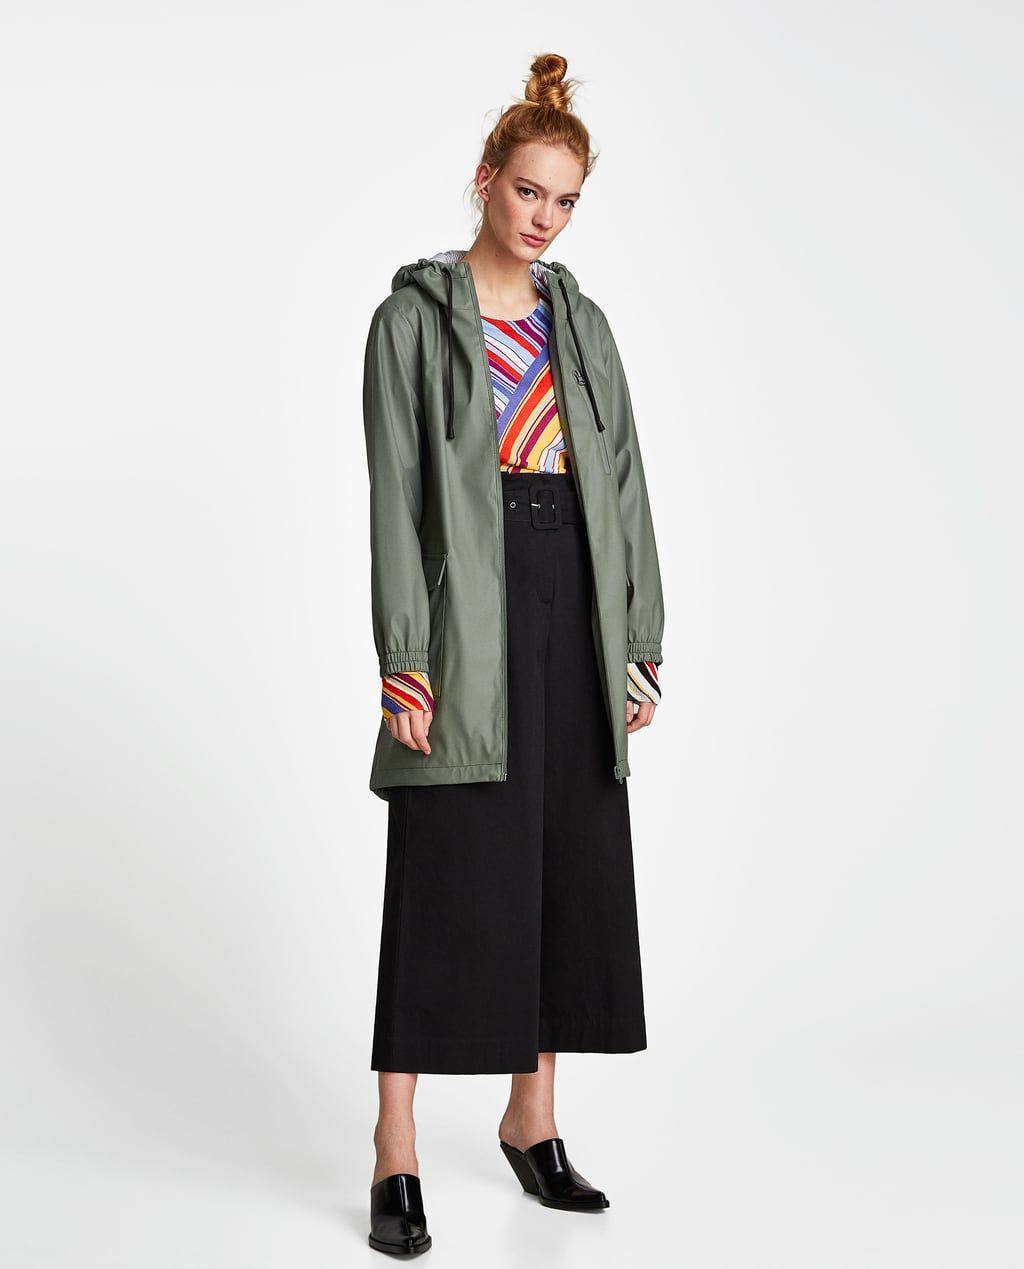 887b2c6d WATER REPELLENT RUBBERIZED PARKA Zara Women, Fashion And Beauty Tips,  Outerwear Women, Duster